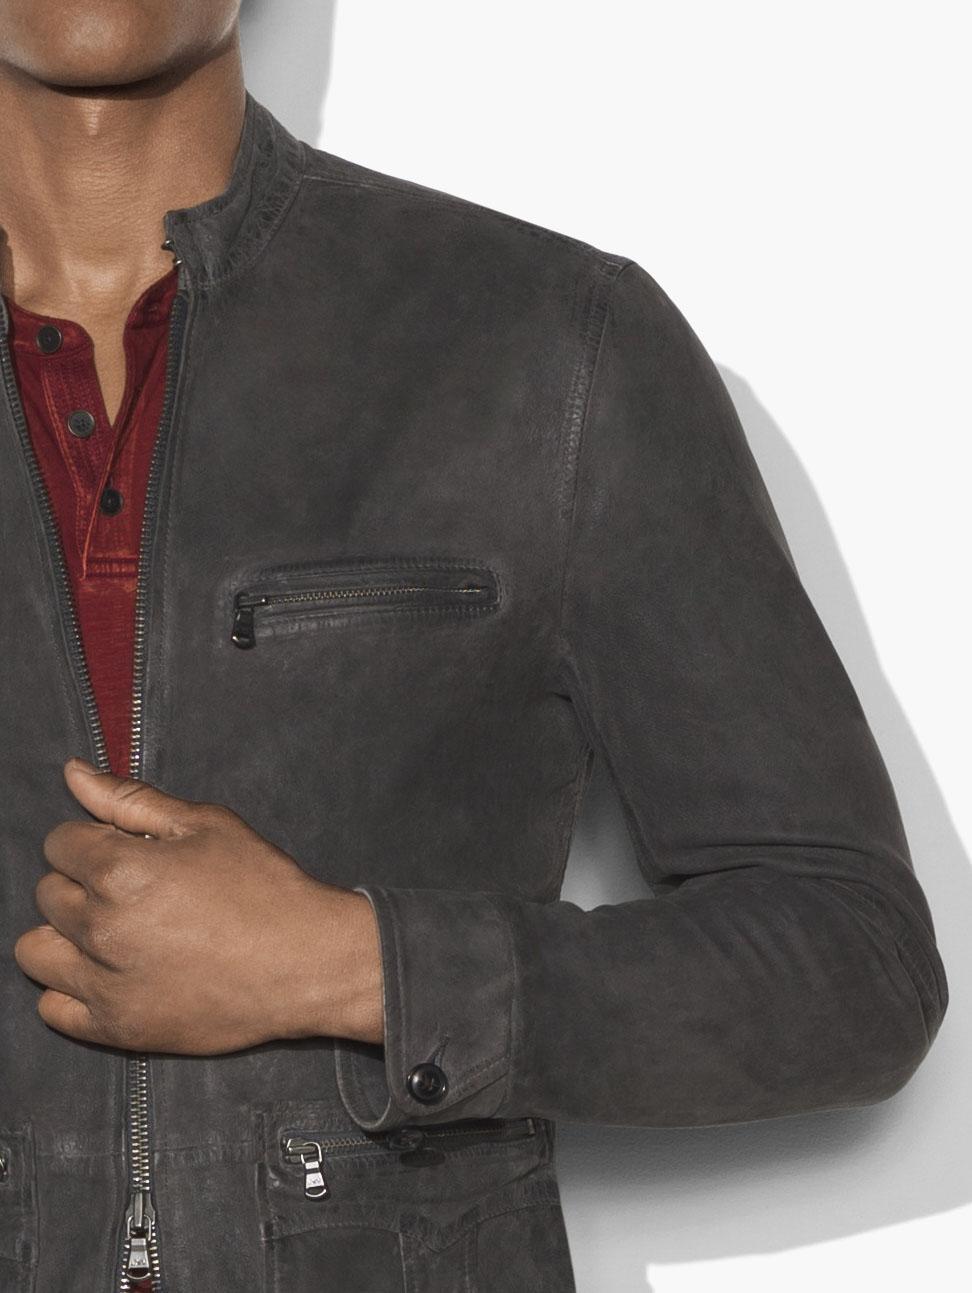 John Varvatos Suede Military Field Racer Jacket in Grey for Men